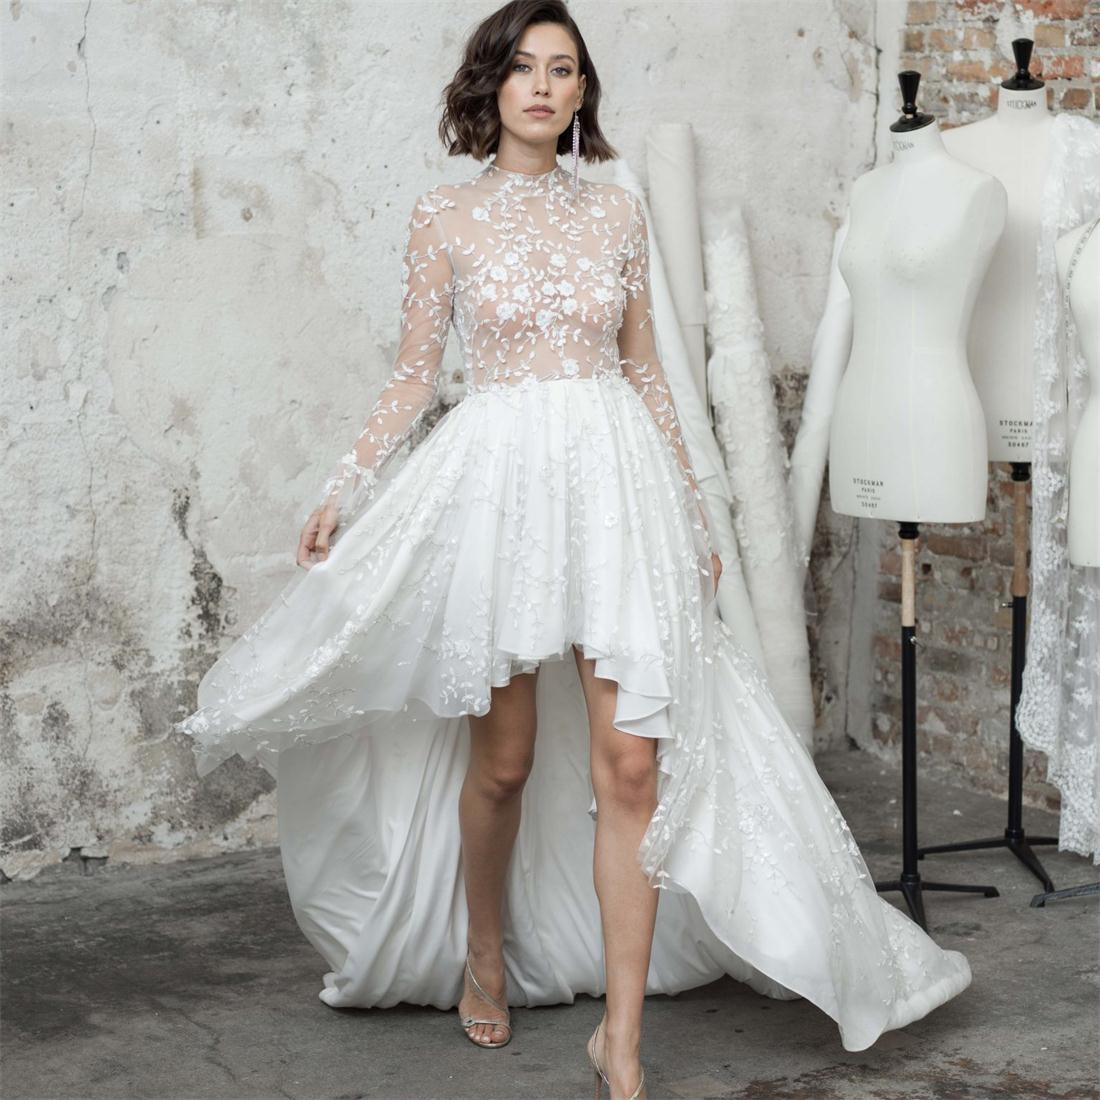 Sexy High Low Wedding Dresses 2021 A Line Backless Vestidos De Novia Lace Applique Customize Sweep Train Long Sleeve Bridal Gowns